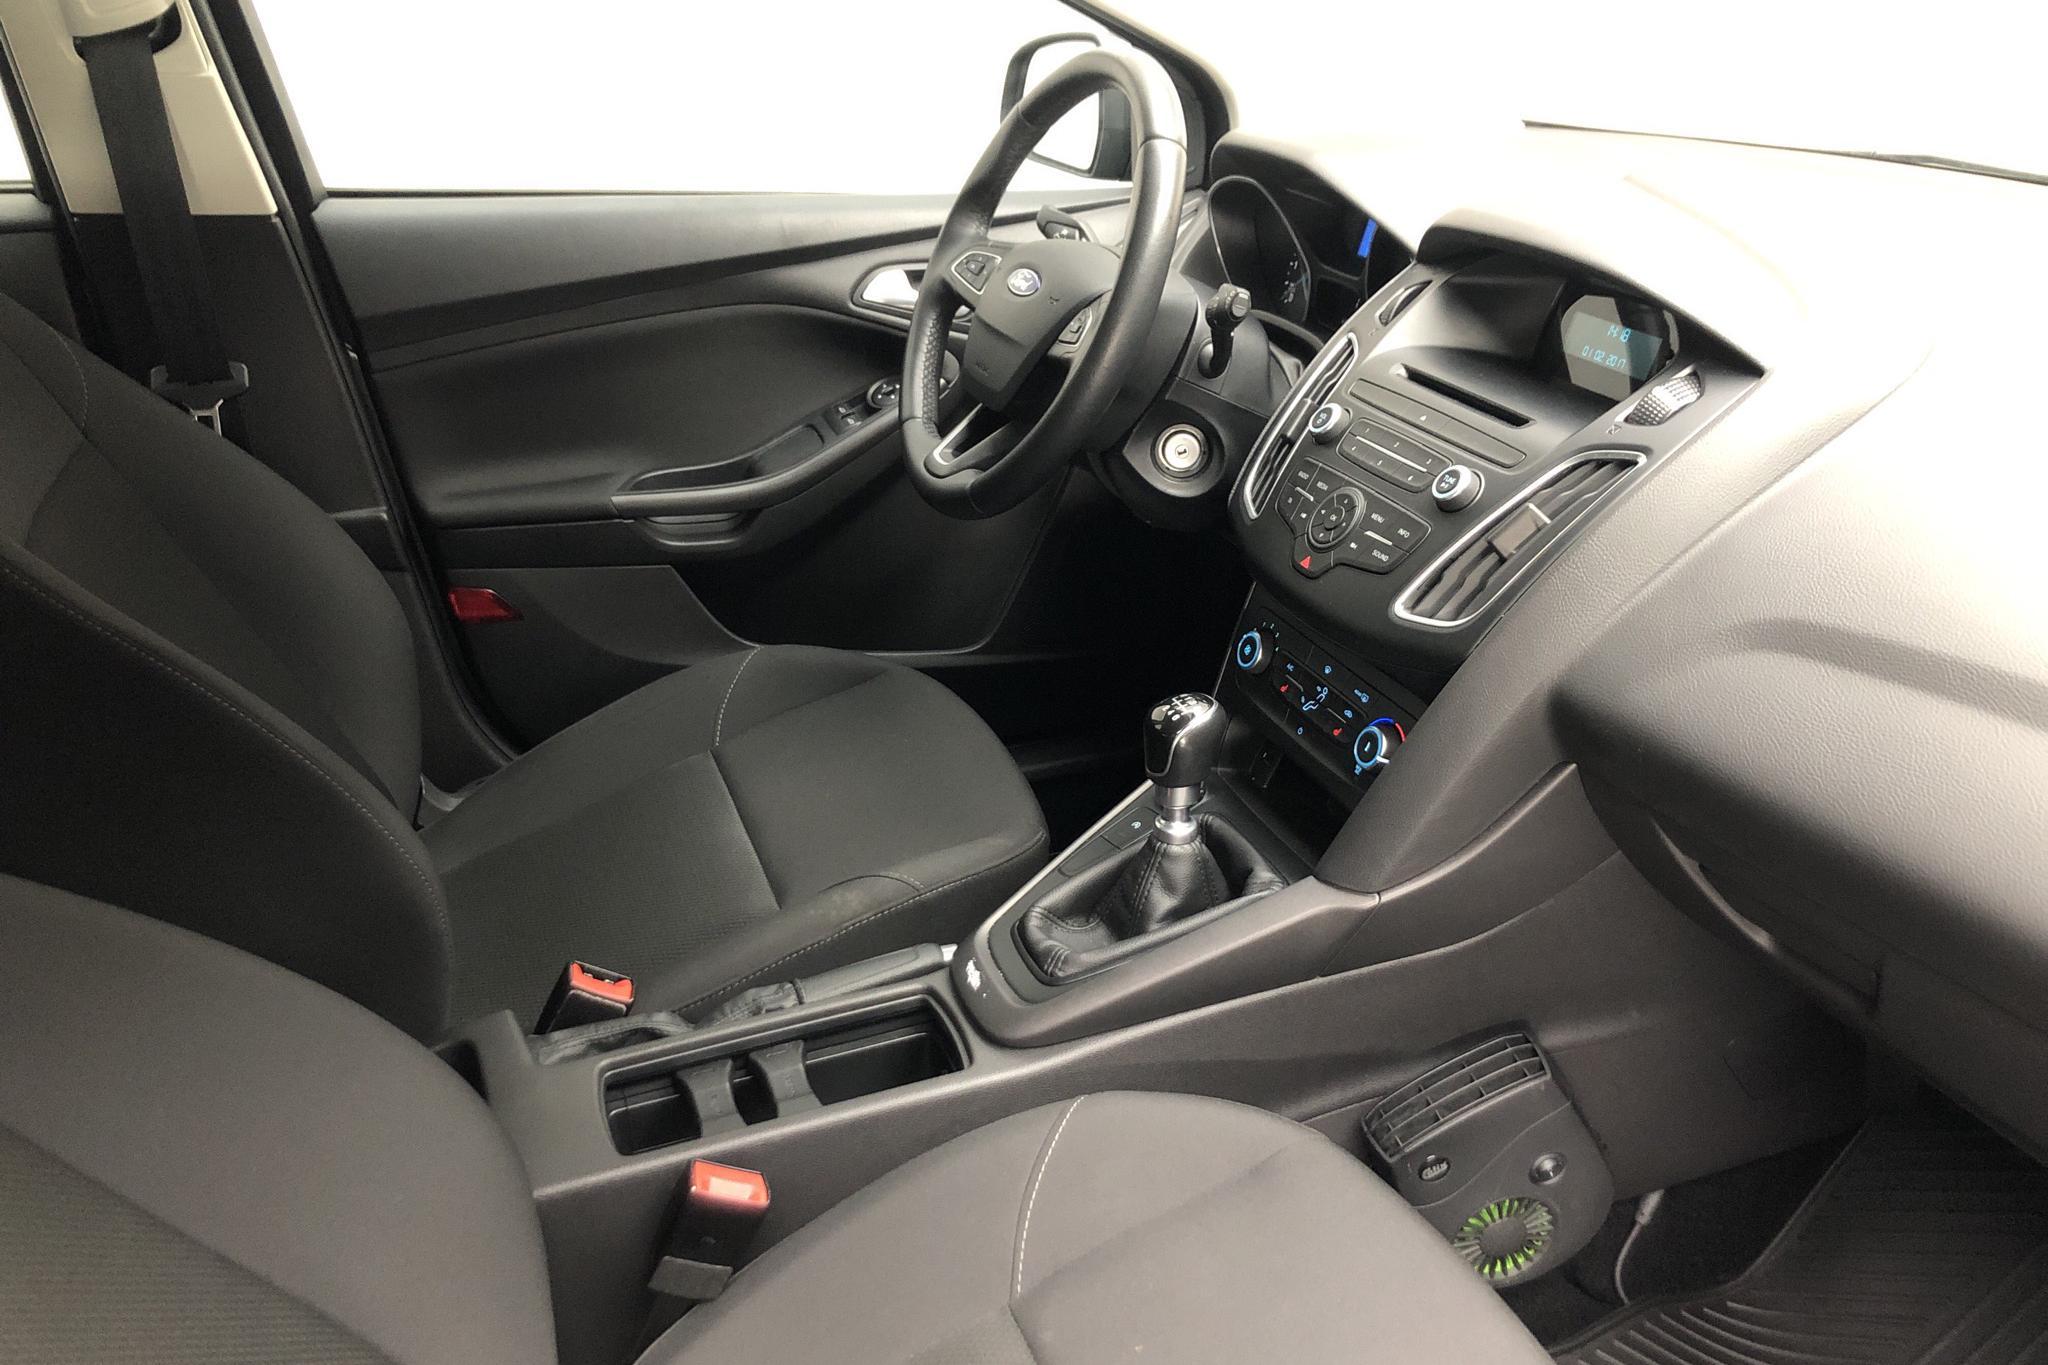 Ford Focus 1.5 TDCi Kombi (95hk) - 2 064 mil - Manuell - grå - 2016